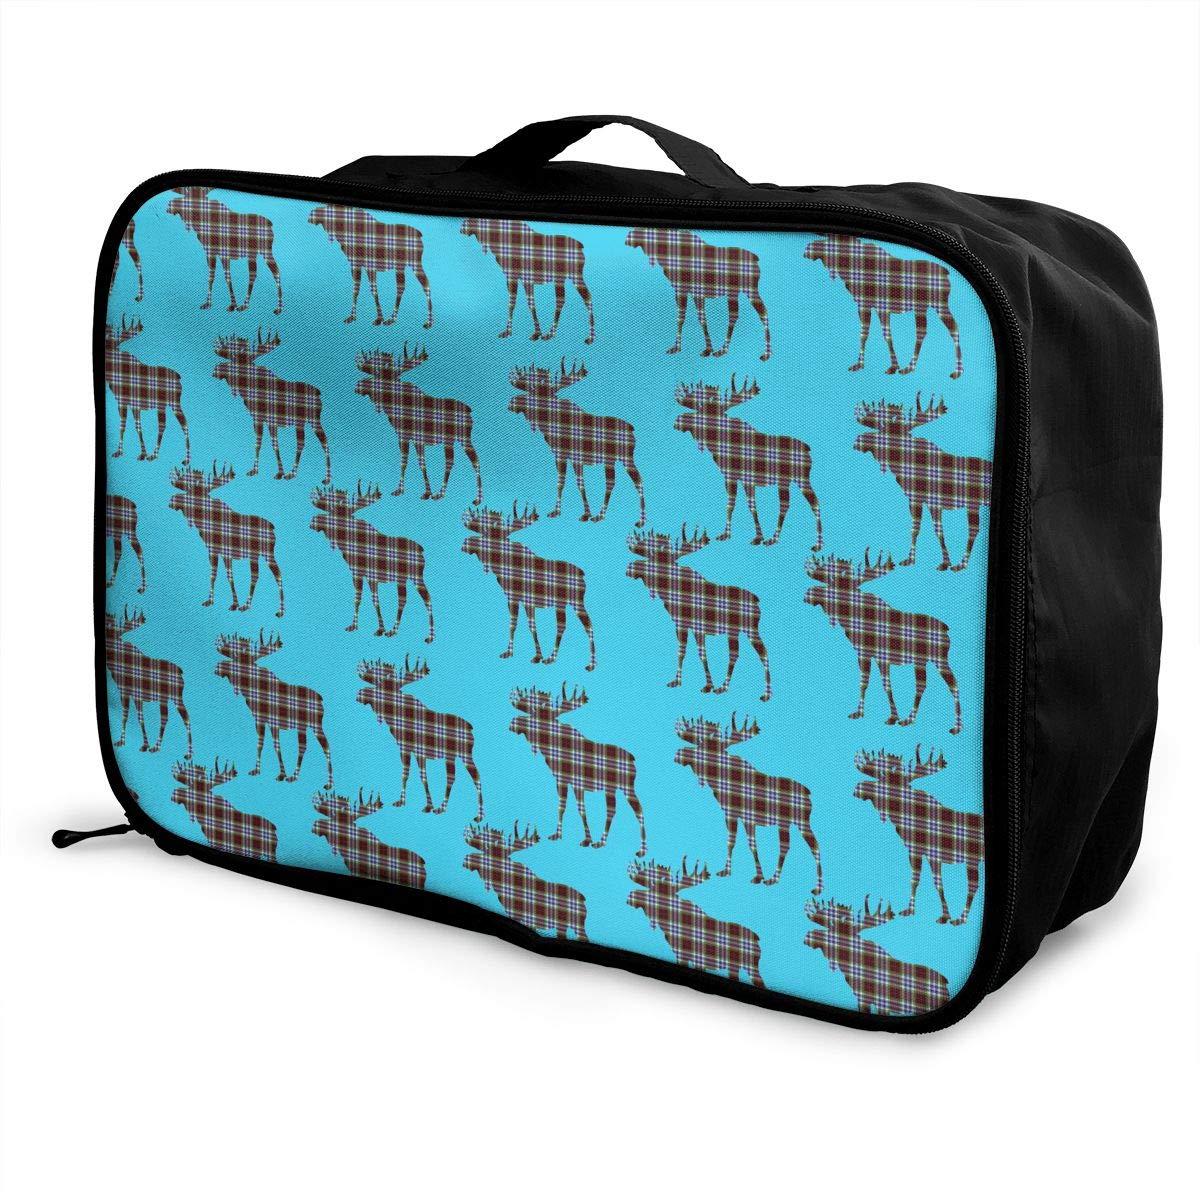 YueLJB Scotland Tartan Moose Lightweight Large Capacity Portable Luggage Bag Travel Duffel Bag Storage Carry Luggage Duffle Tote Bag